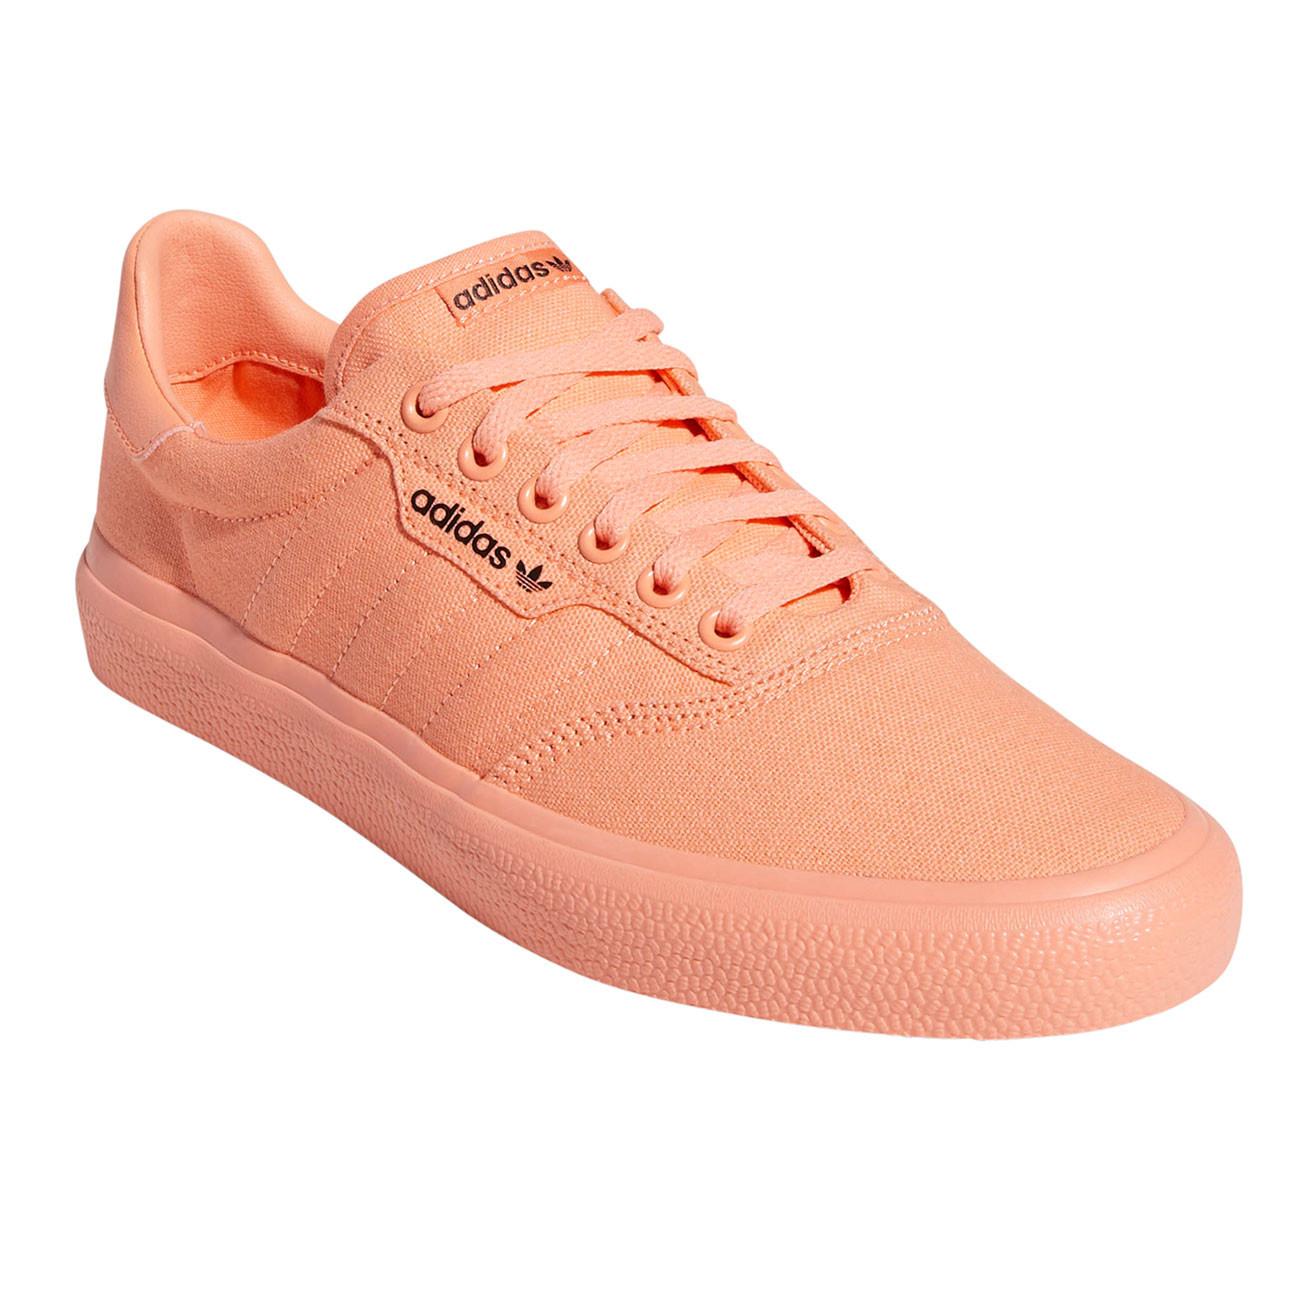 Sneakers Adidas 3MC chalk coral/core